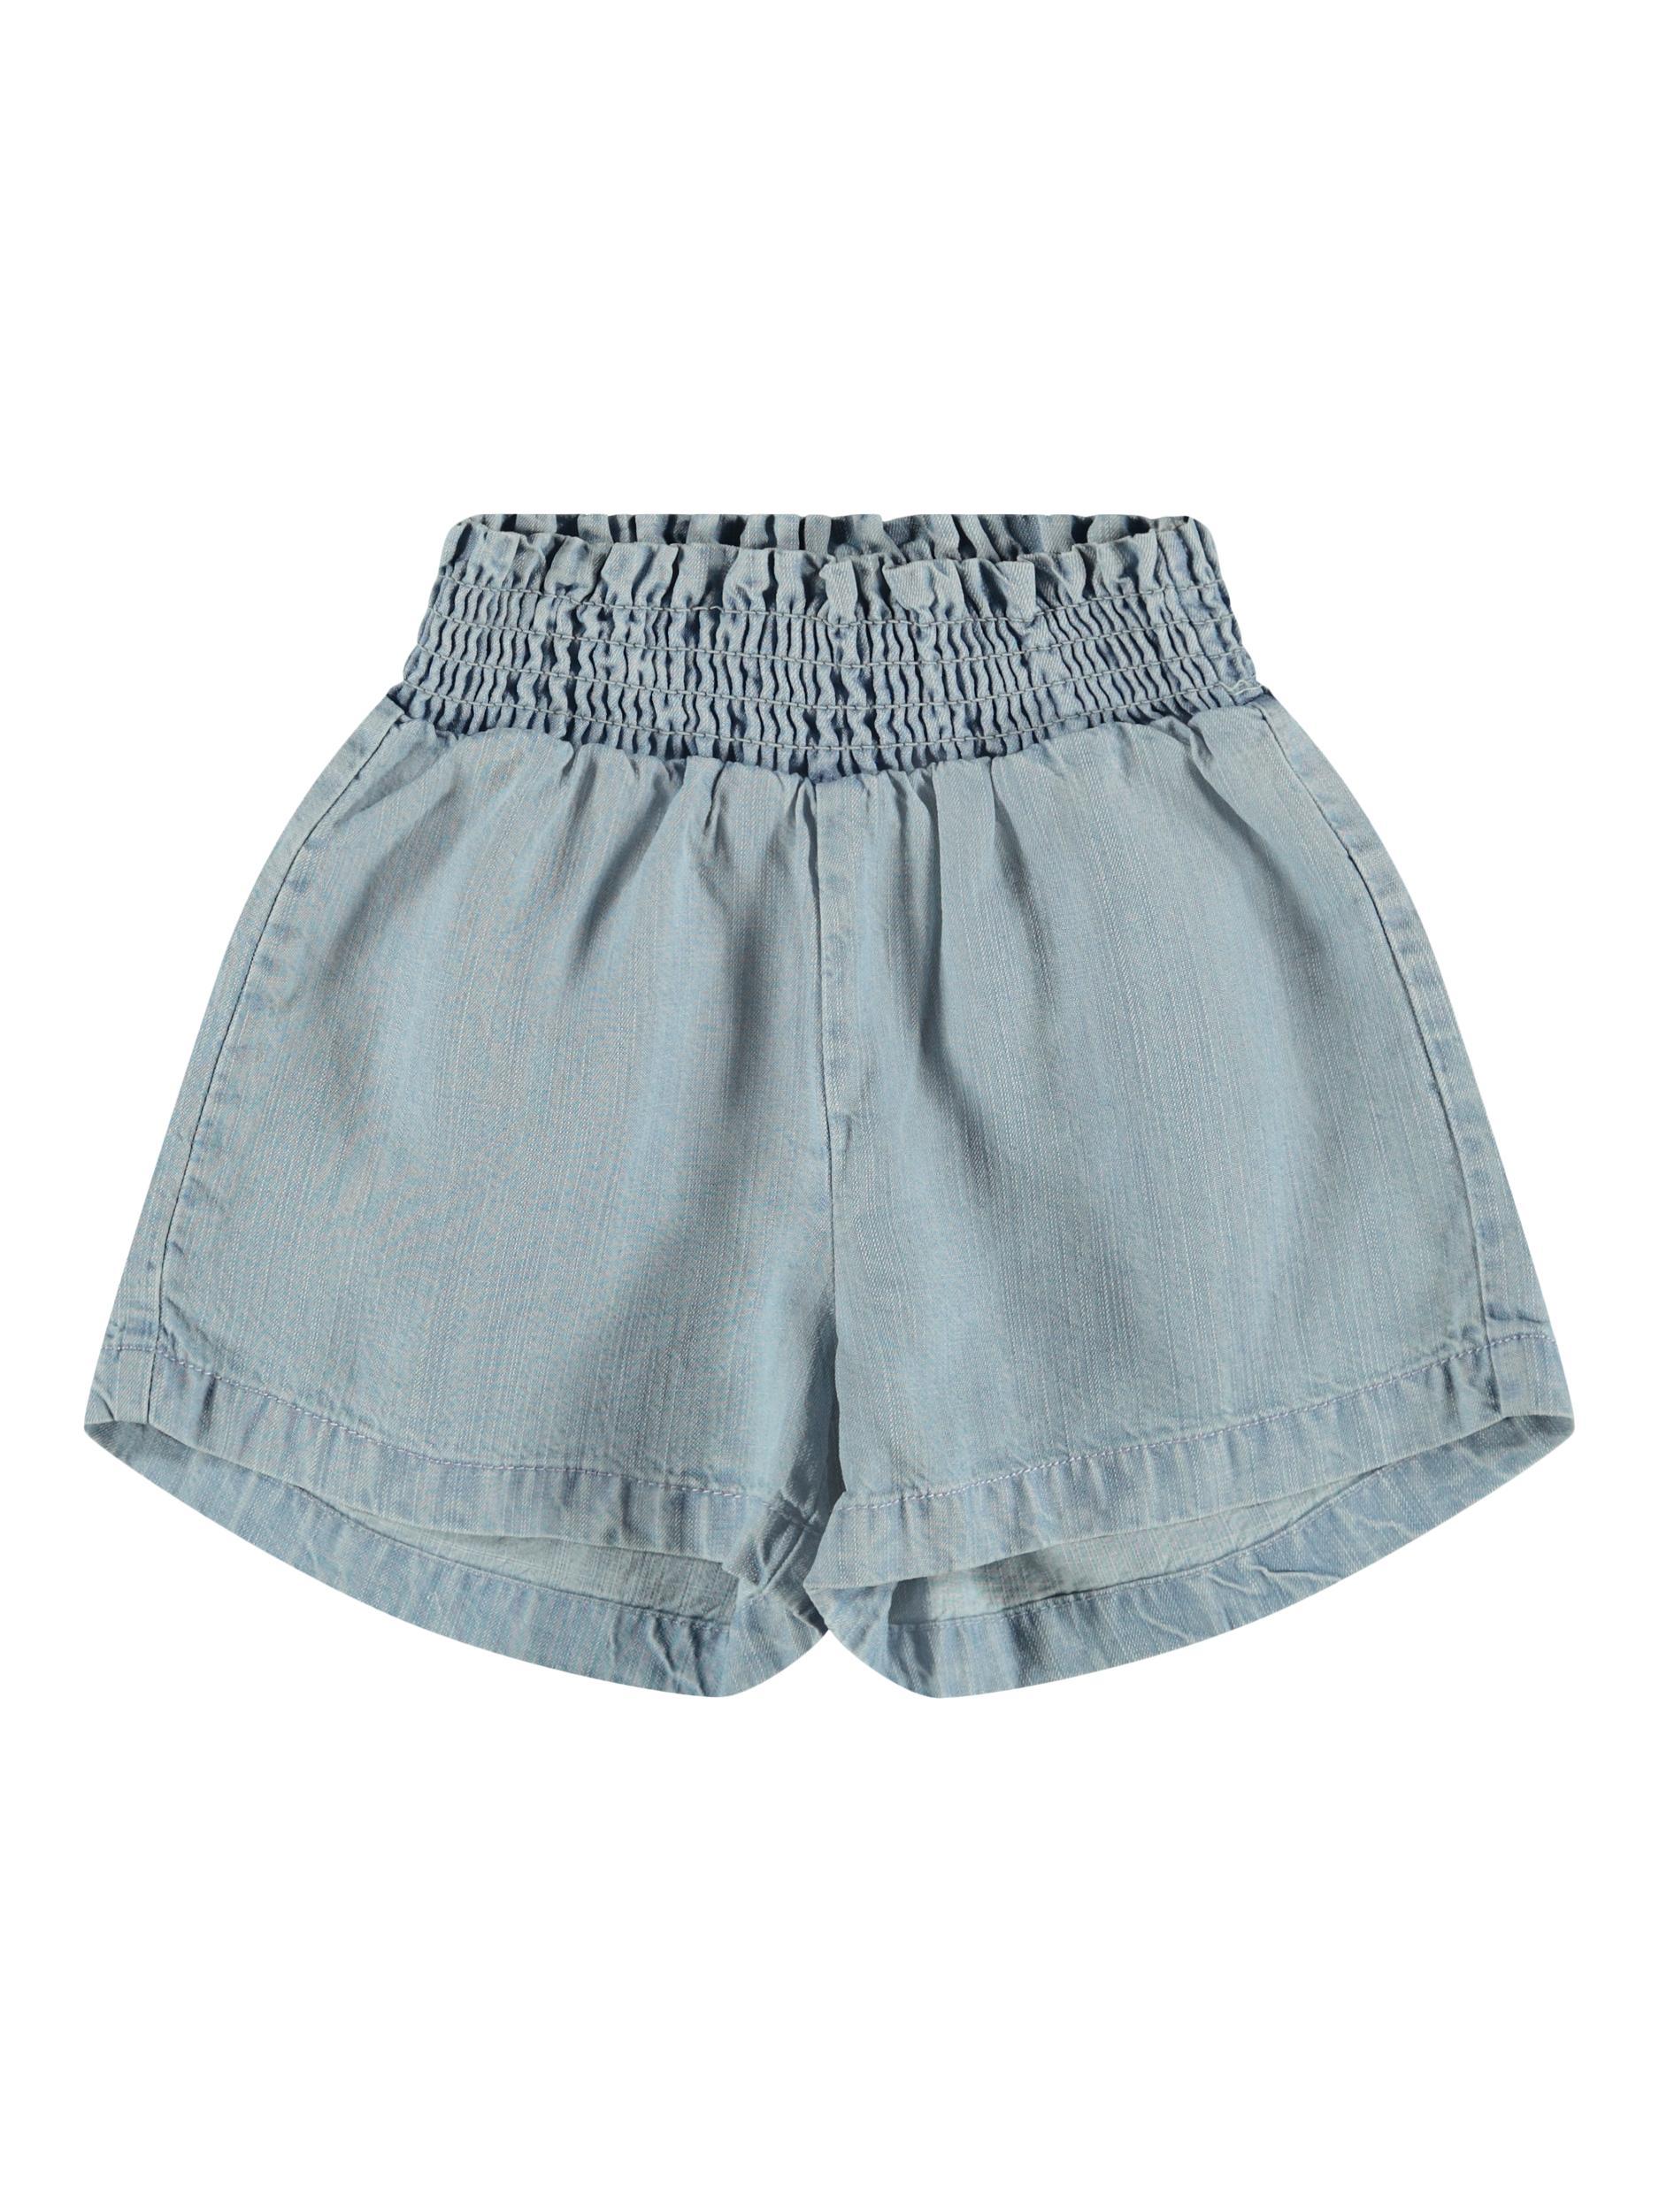 Name It Becky shorts, light blue denim, 104